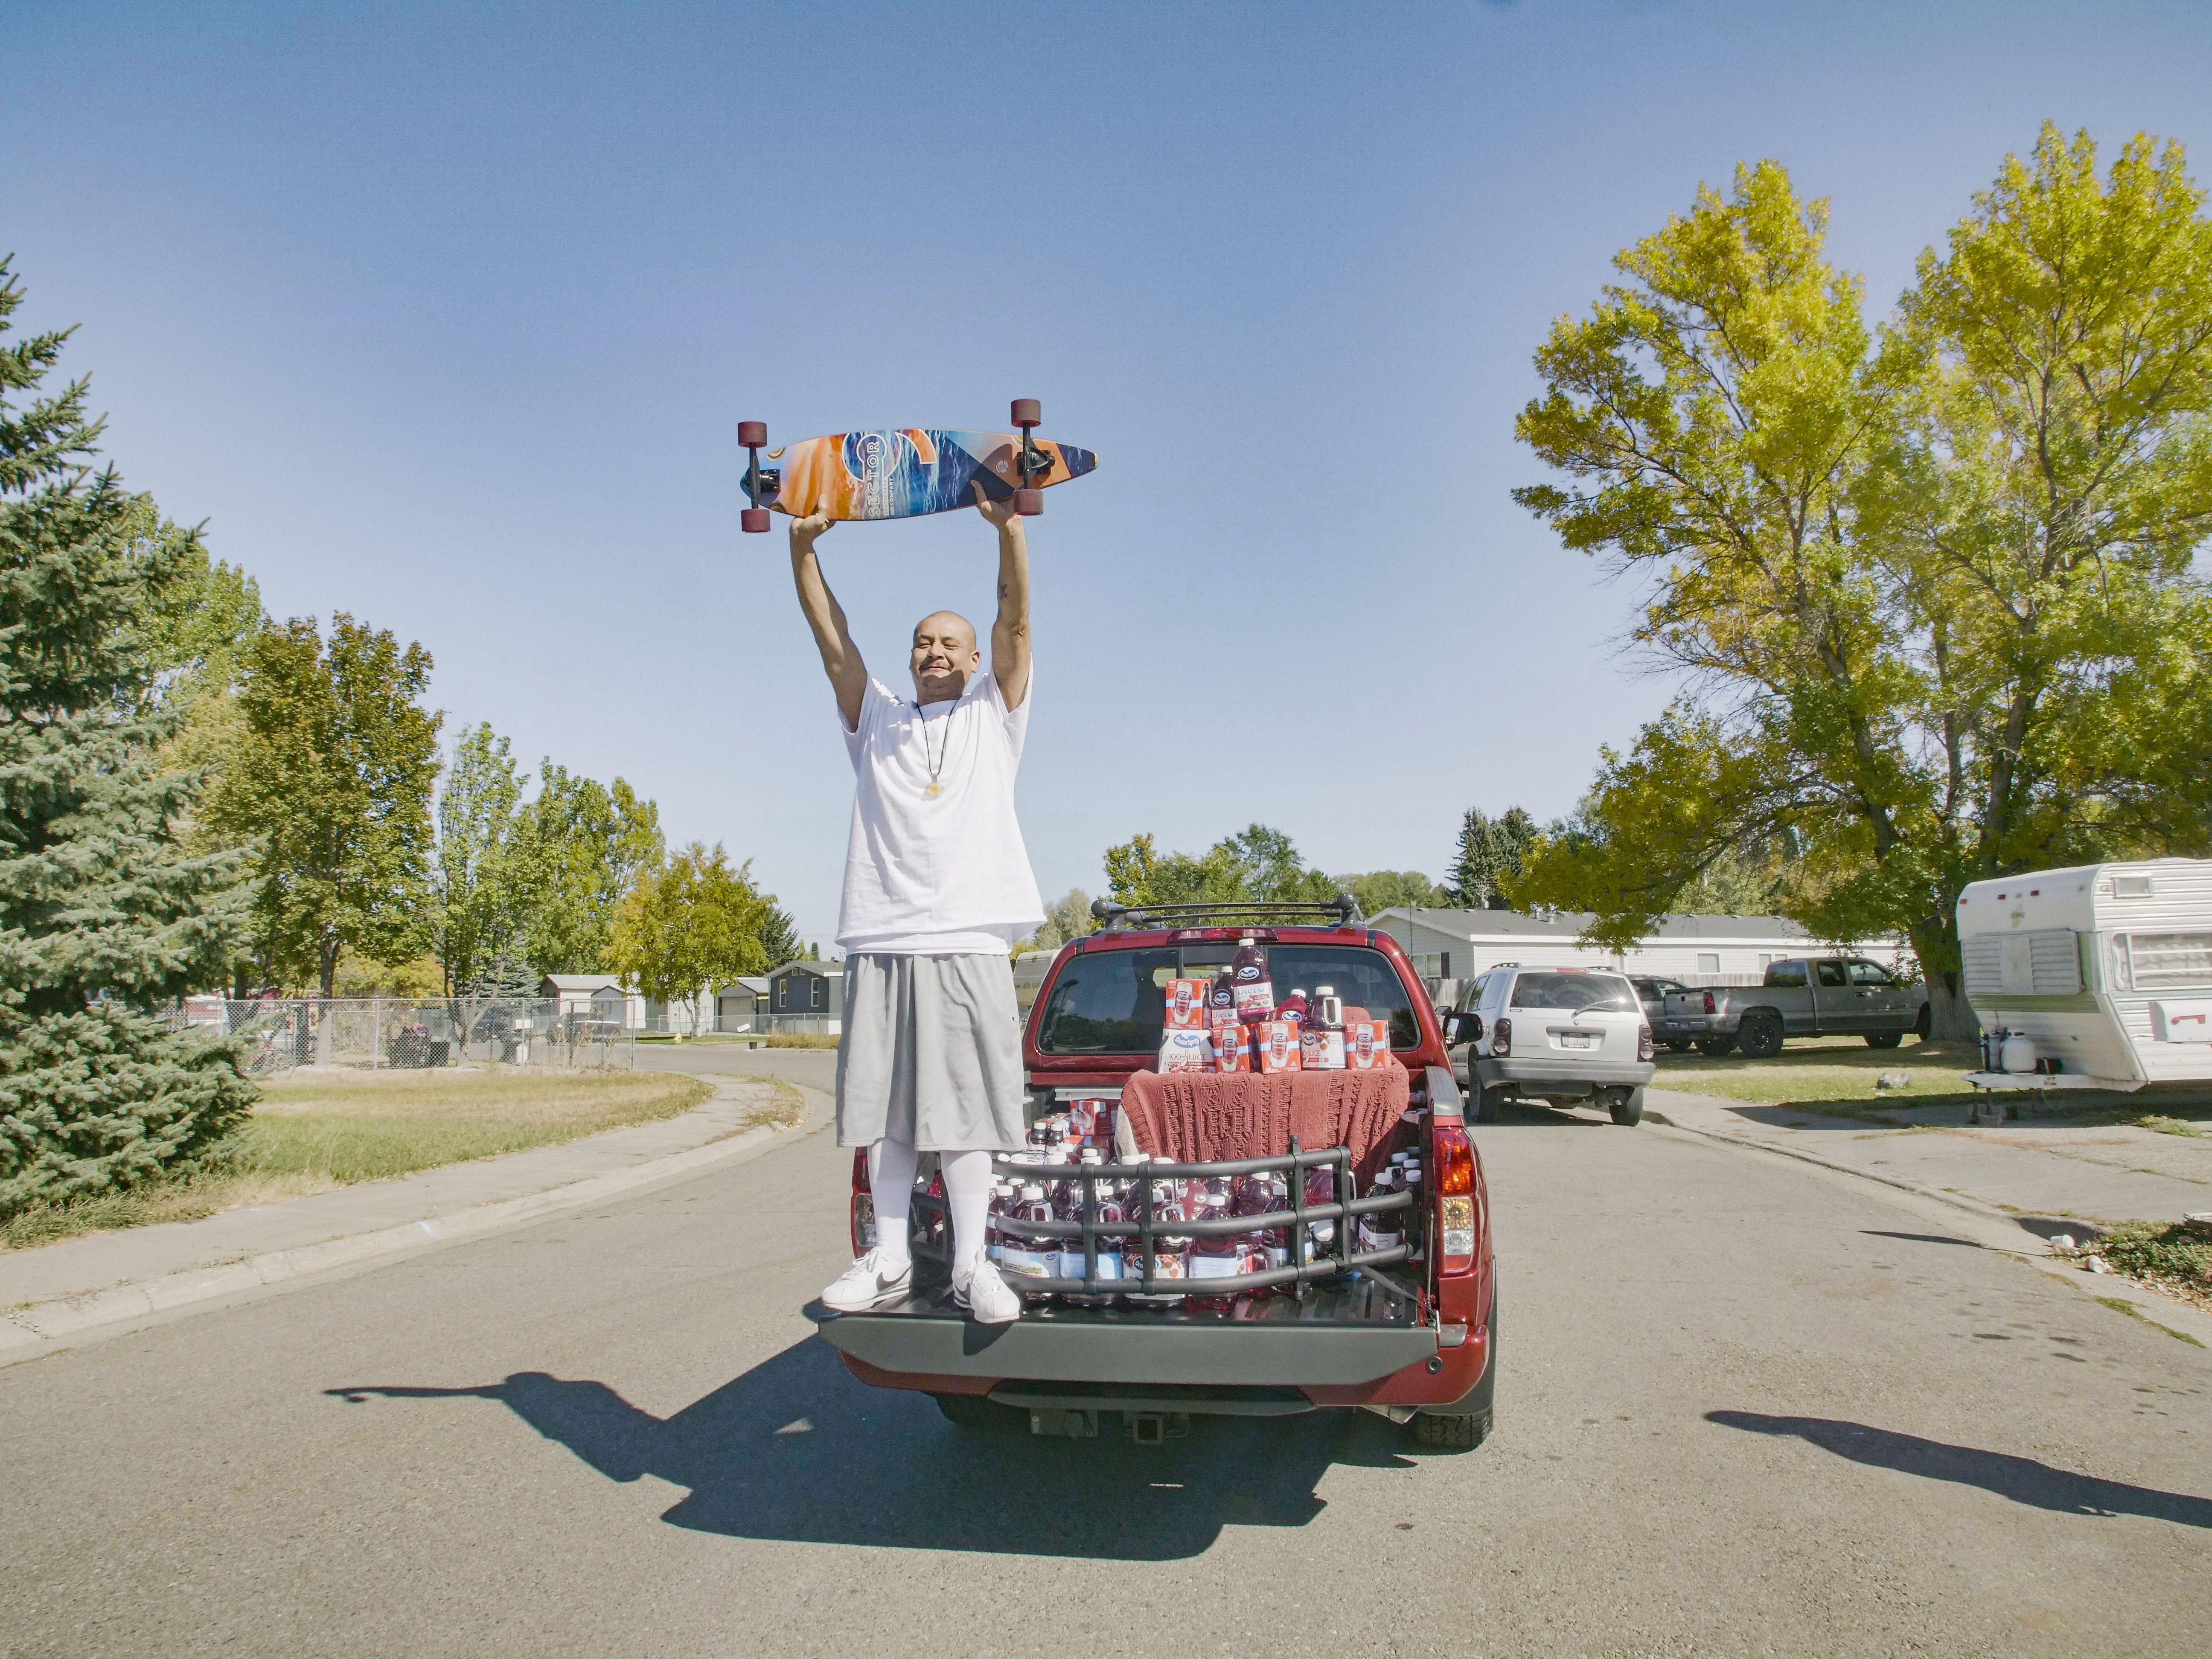 Ocean Spray gifts a truck to viral TikTok star singing Fleetwood Mac, drinking Cran-Raspberry